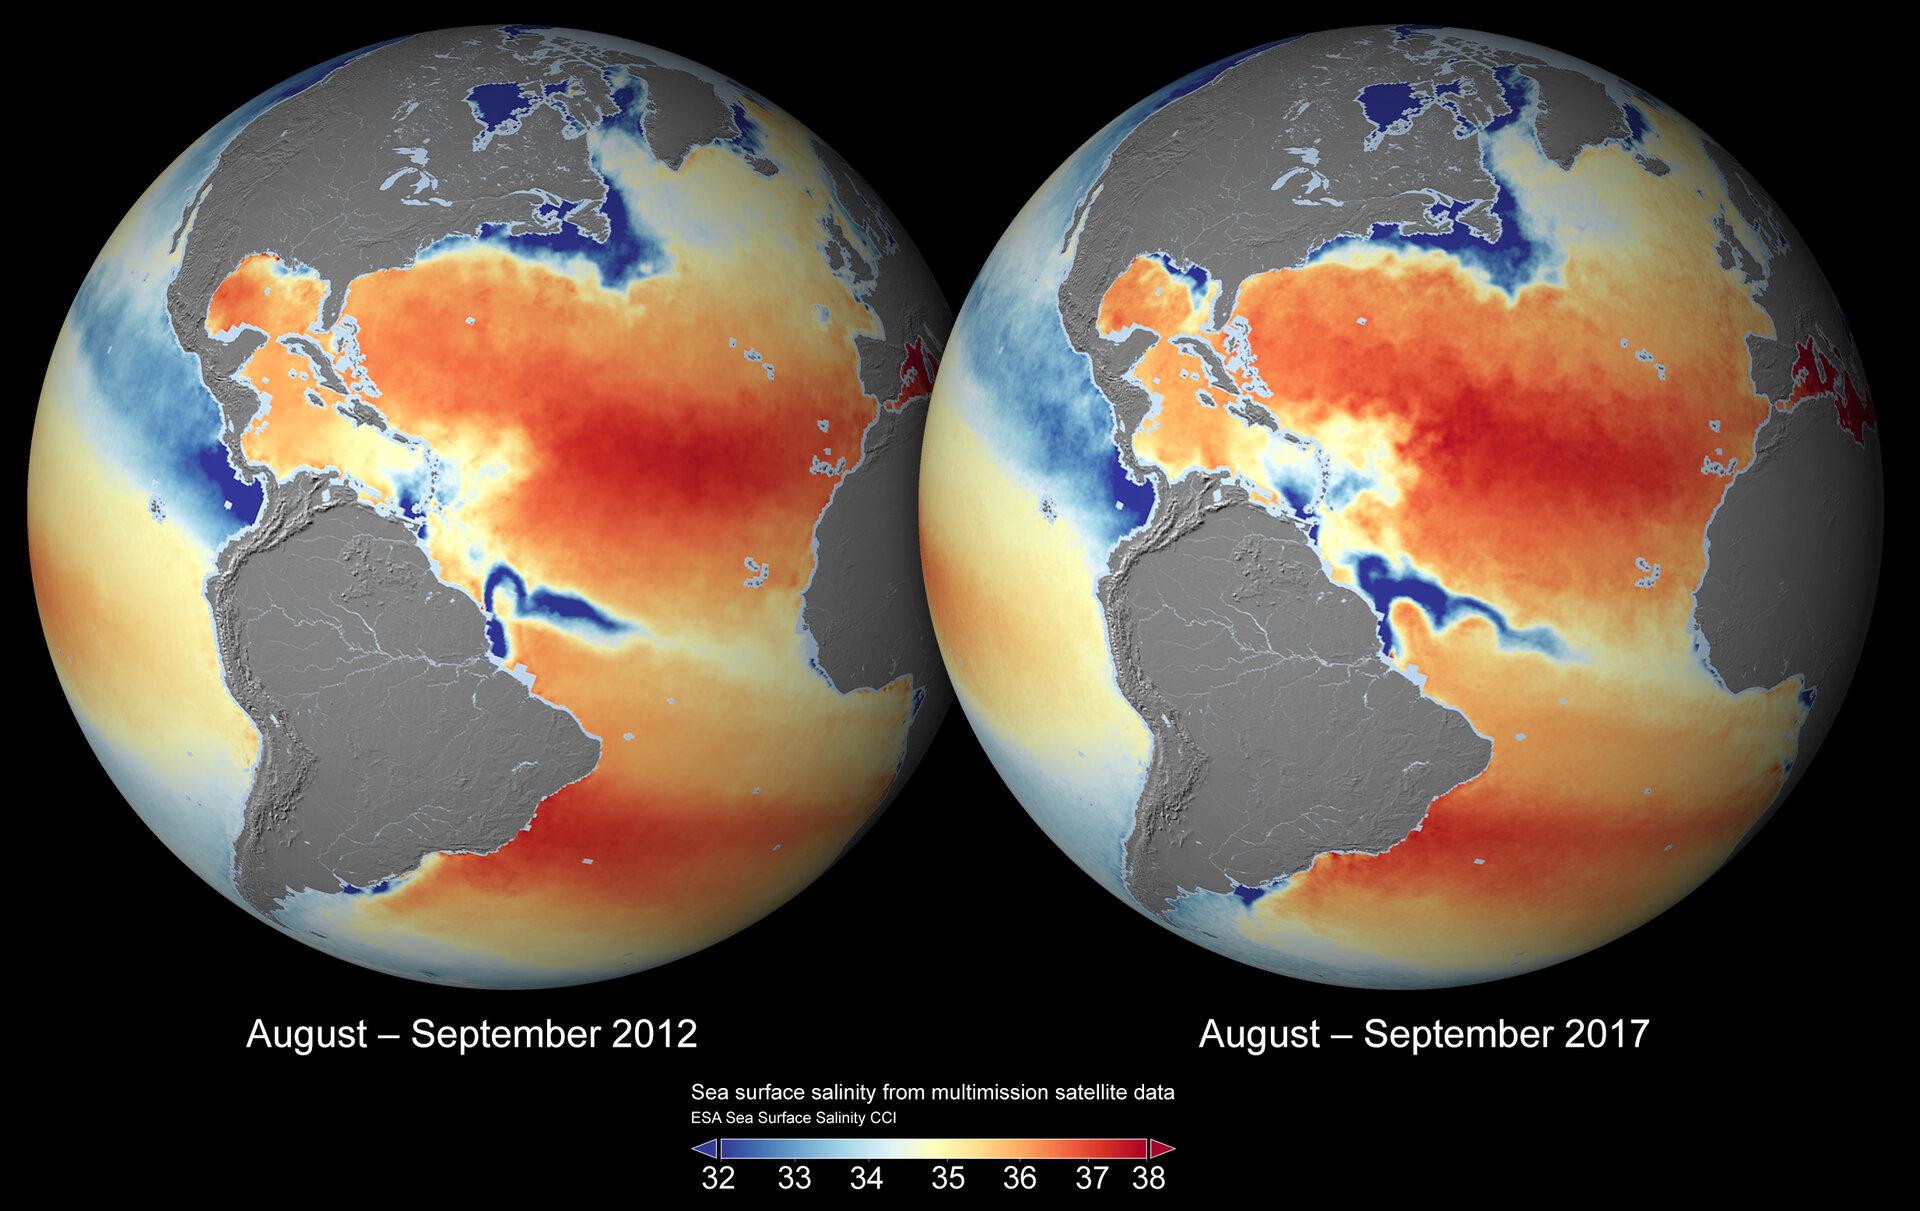 Global sea-surface salinity 2012 and 2017